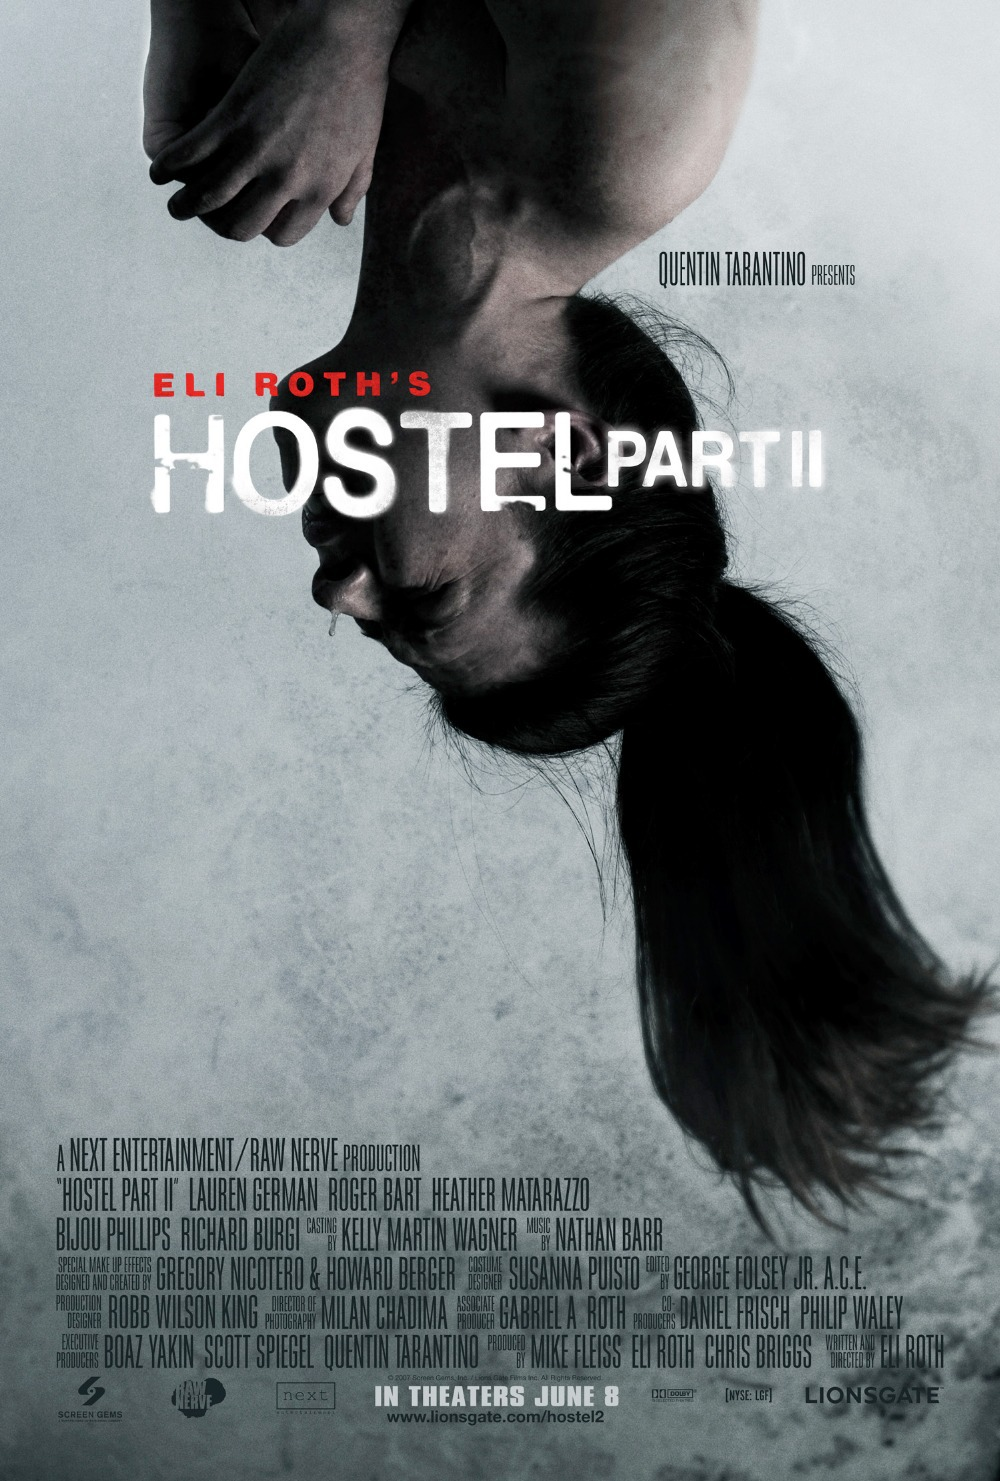 HOSTEL Part II 2 Movie Poster Horror Torture Porn Eli Roth Print on Silk  Home Decoration 12x18 24x36 inch